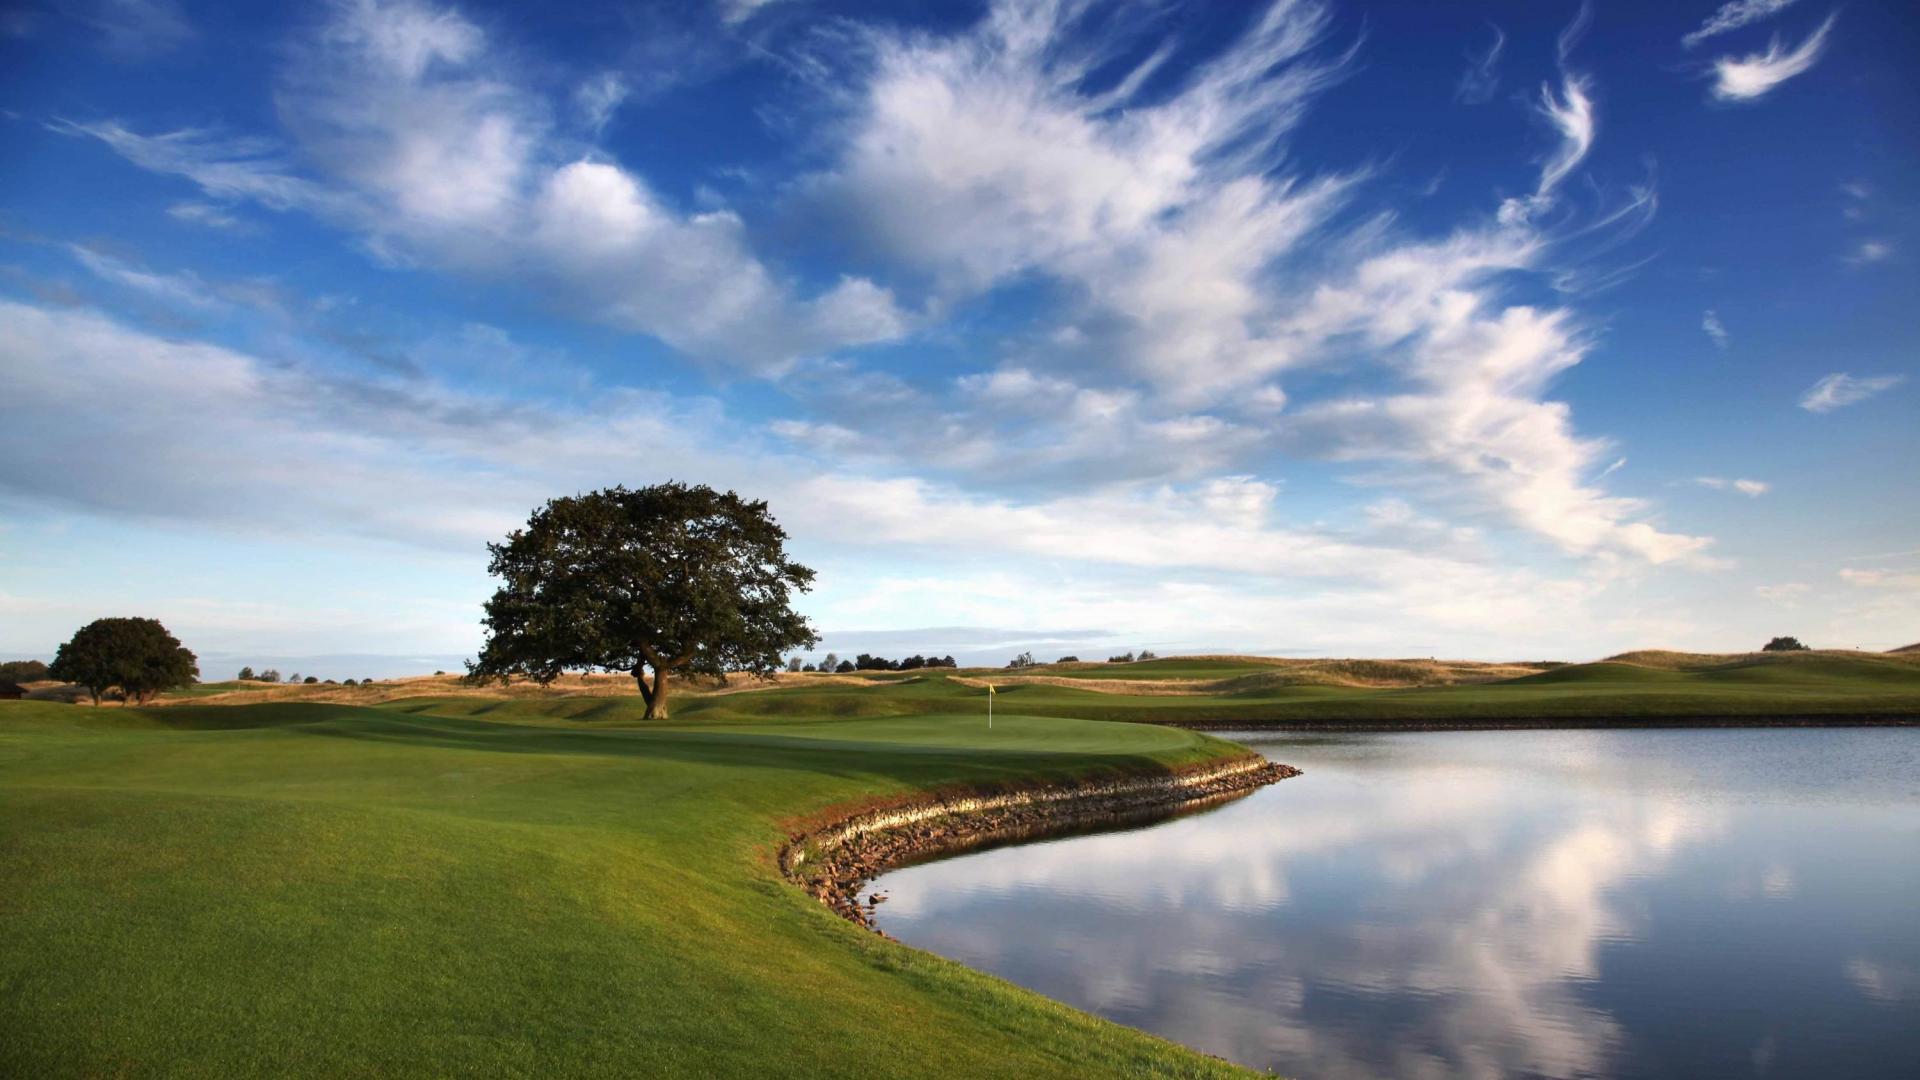 wonderful golf course wallpaper 46044